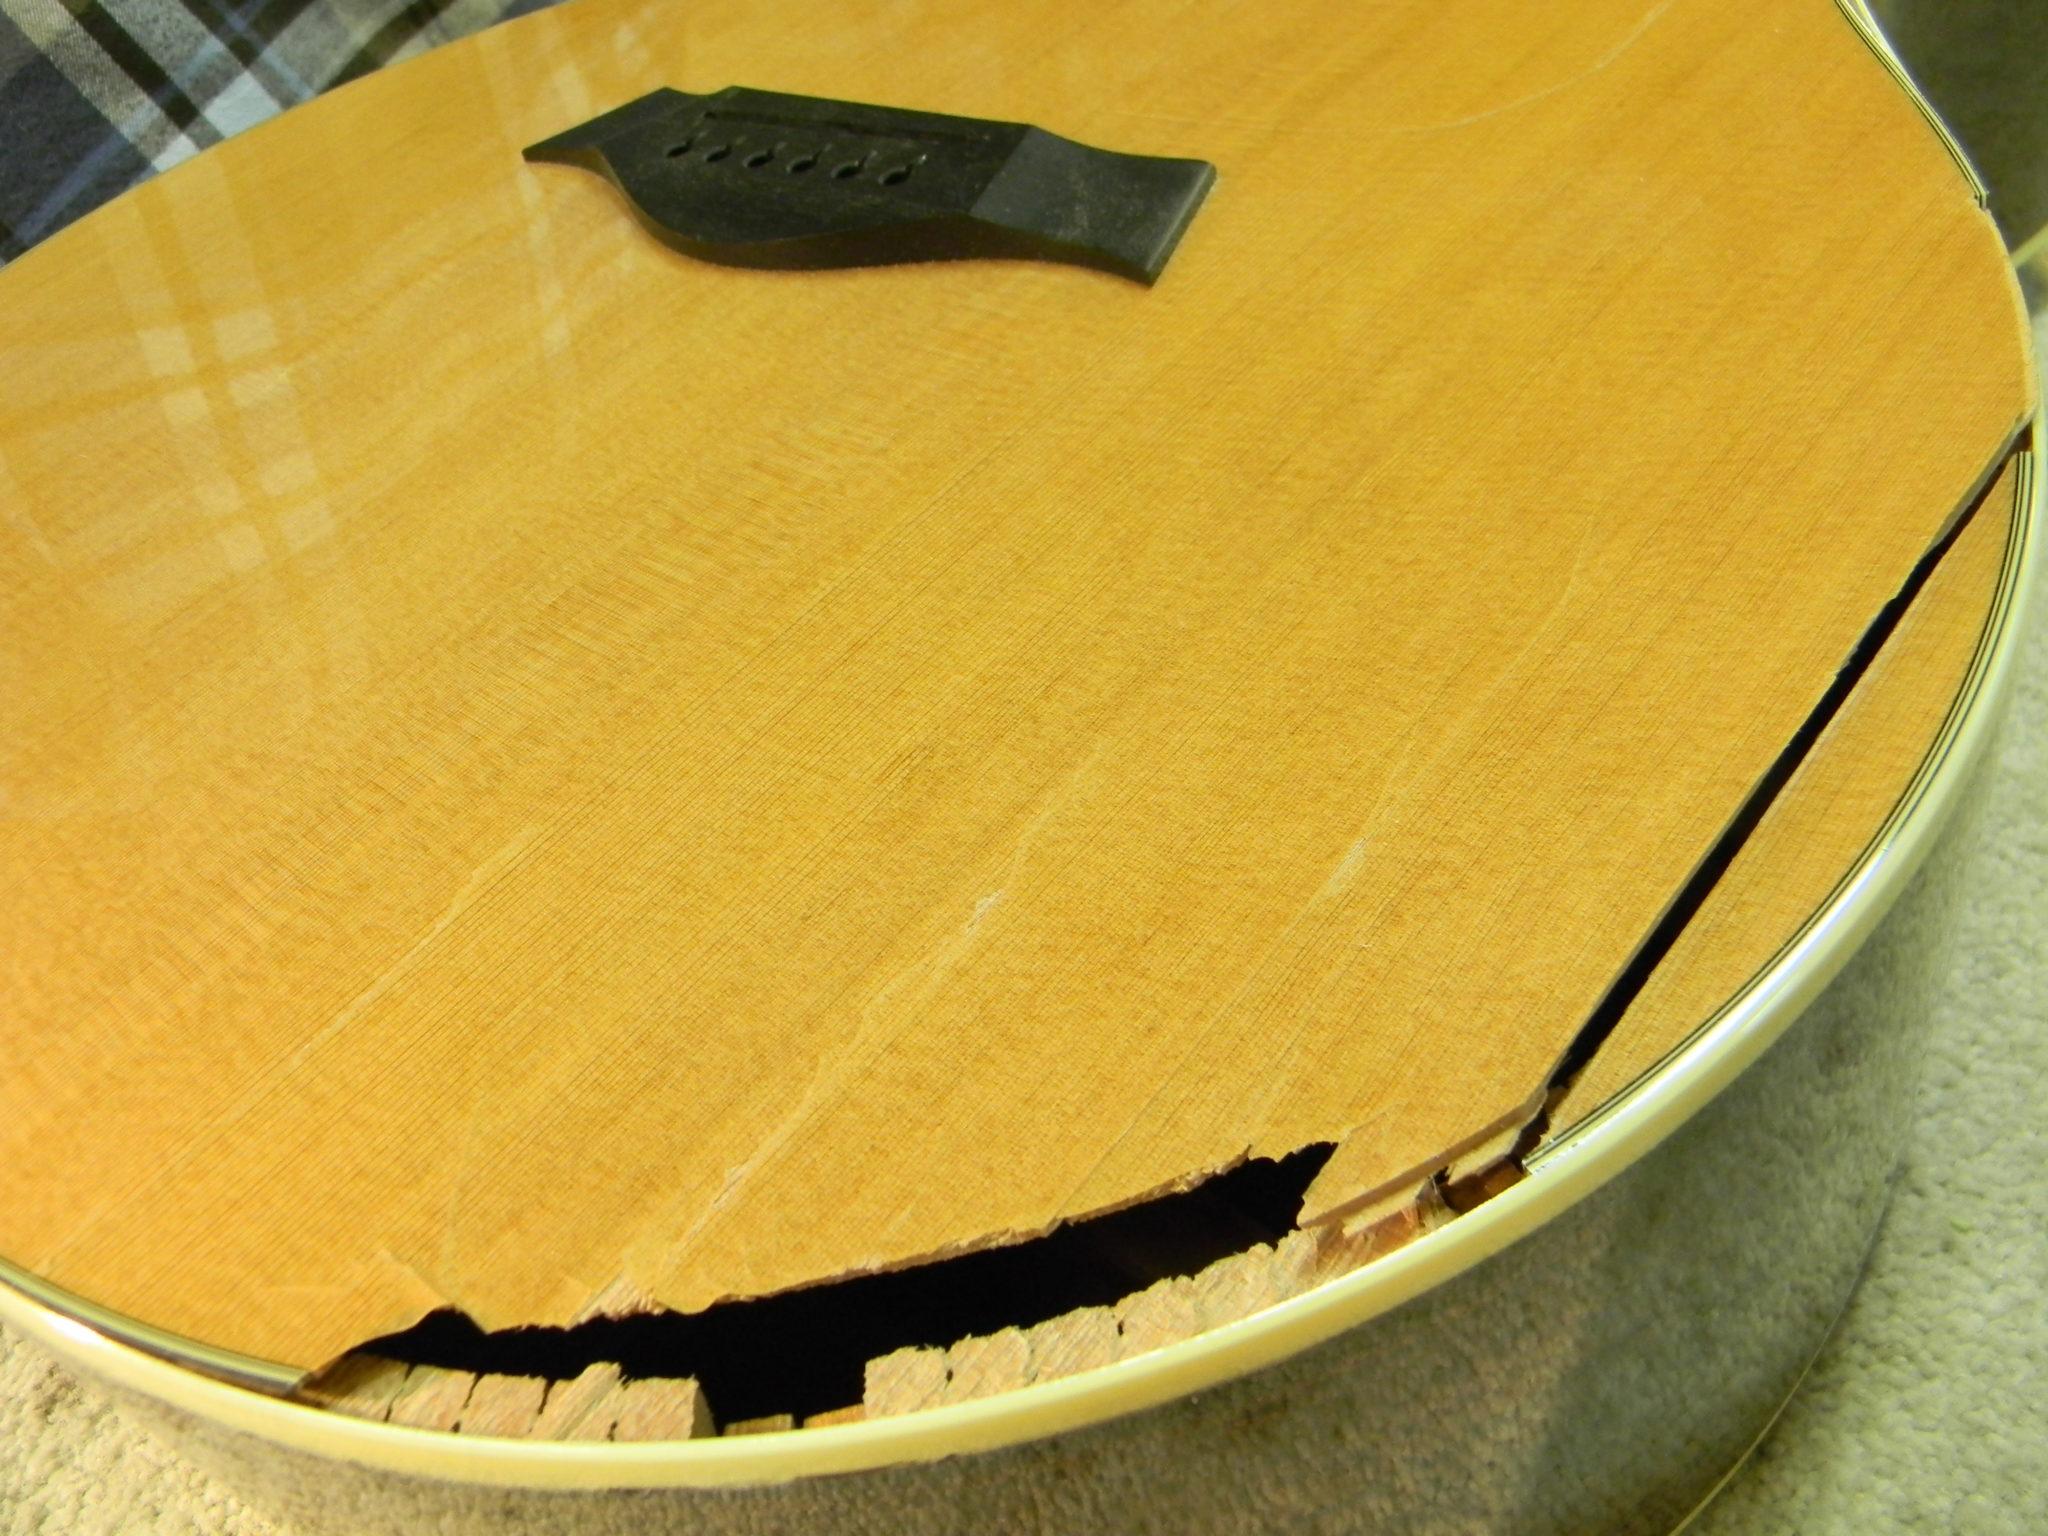 Taylor Gs7 Acoustic Top Repair And Sunburst Refin Chicago Fret